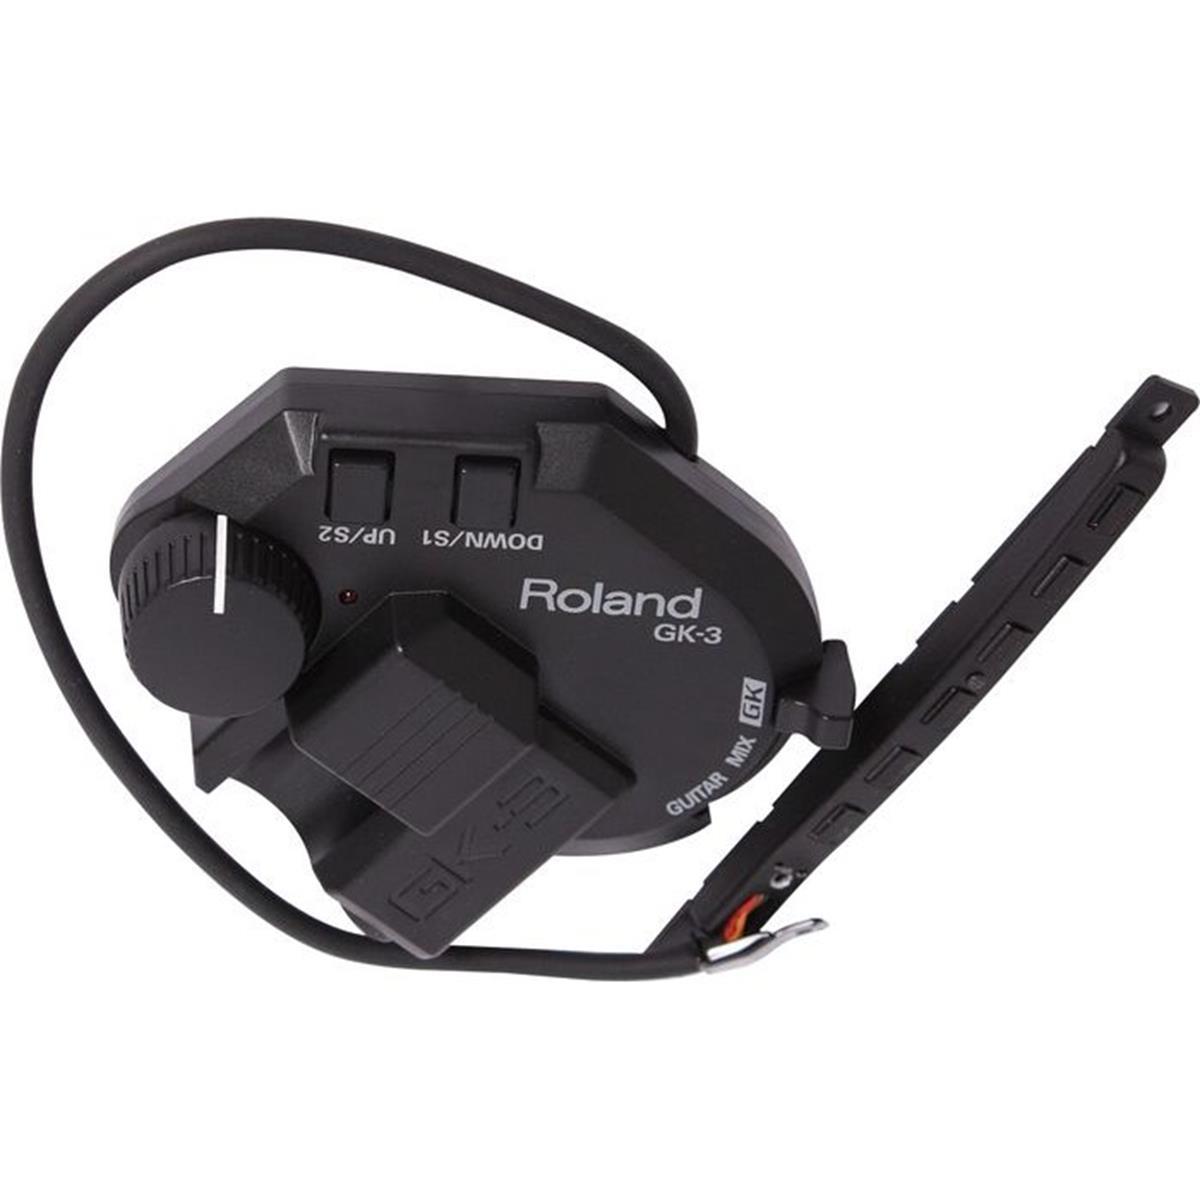 ROLAND-GK-3-PICK-UP-ESAFONICO-sku-15625